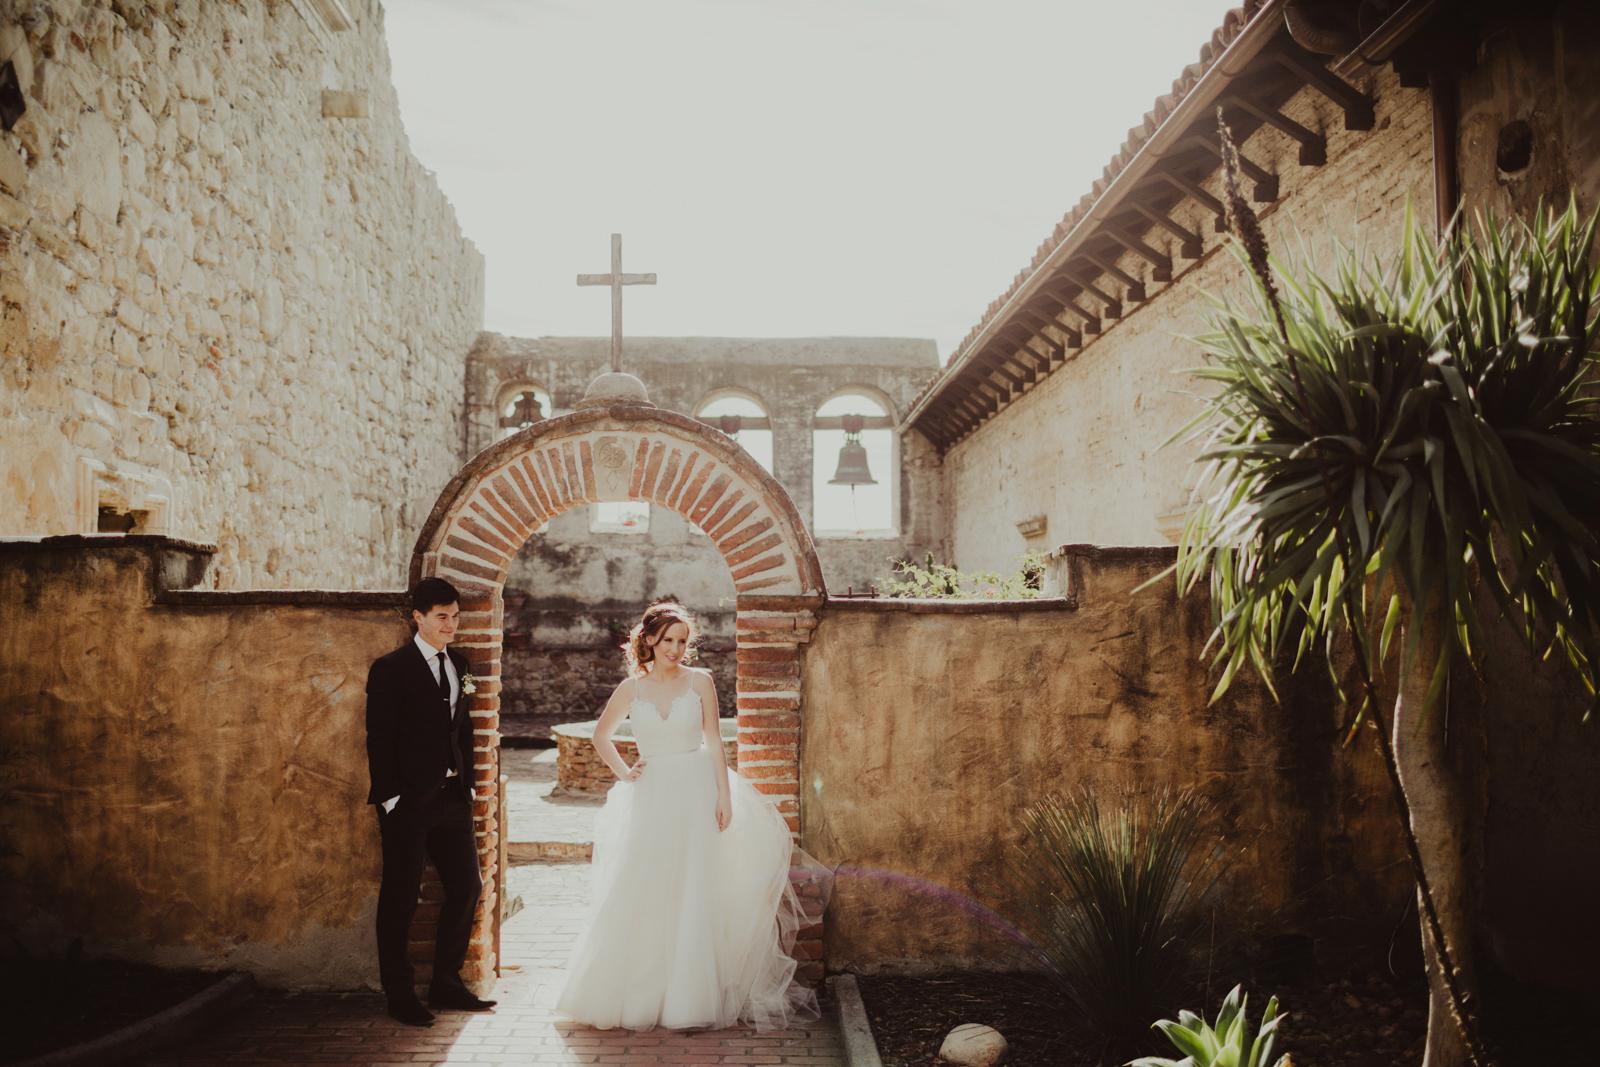 PaulSimonPhotography-JessicaJosh-SanJuanCapistranoWedding-46.jpg